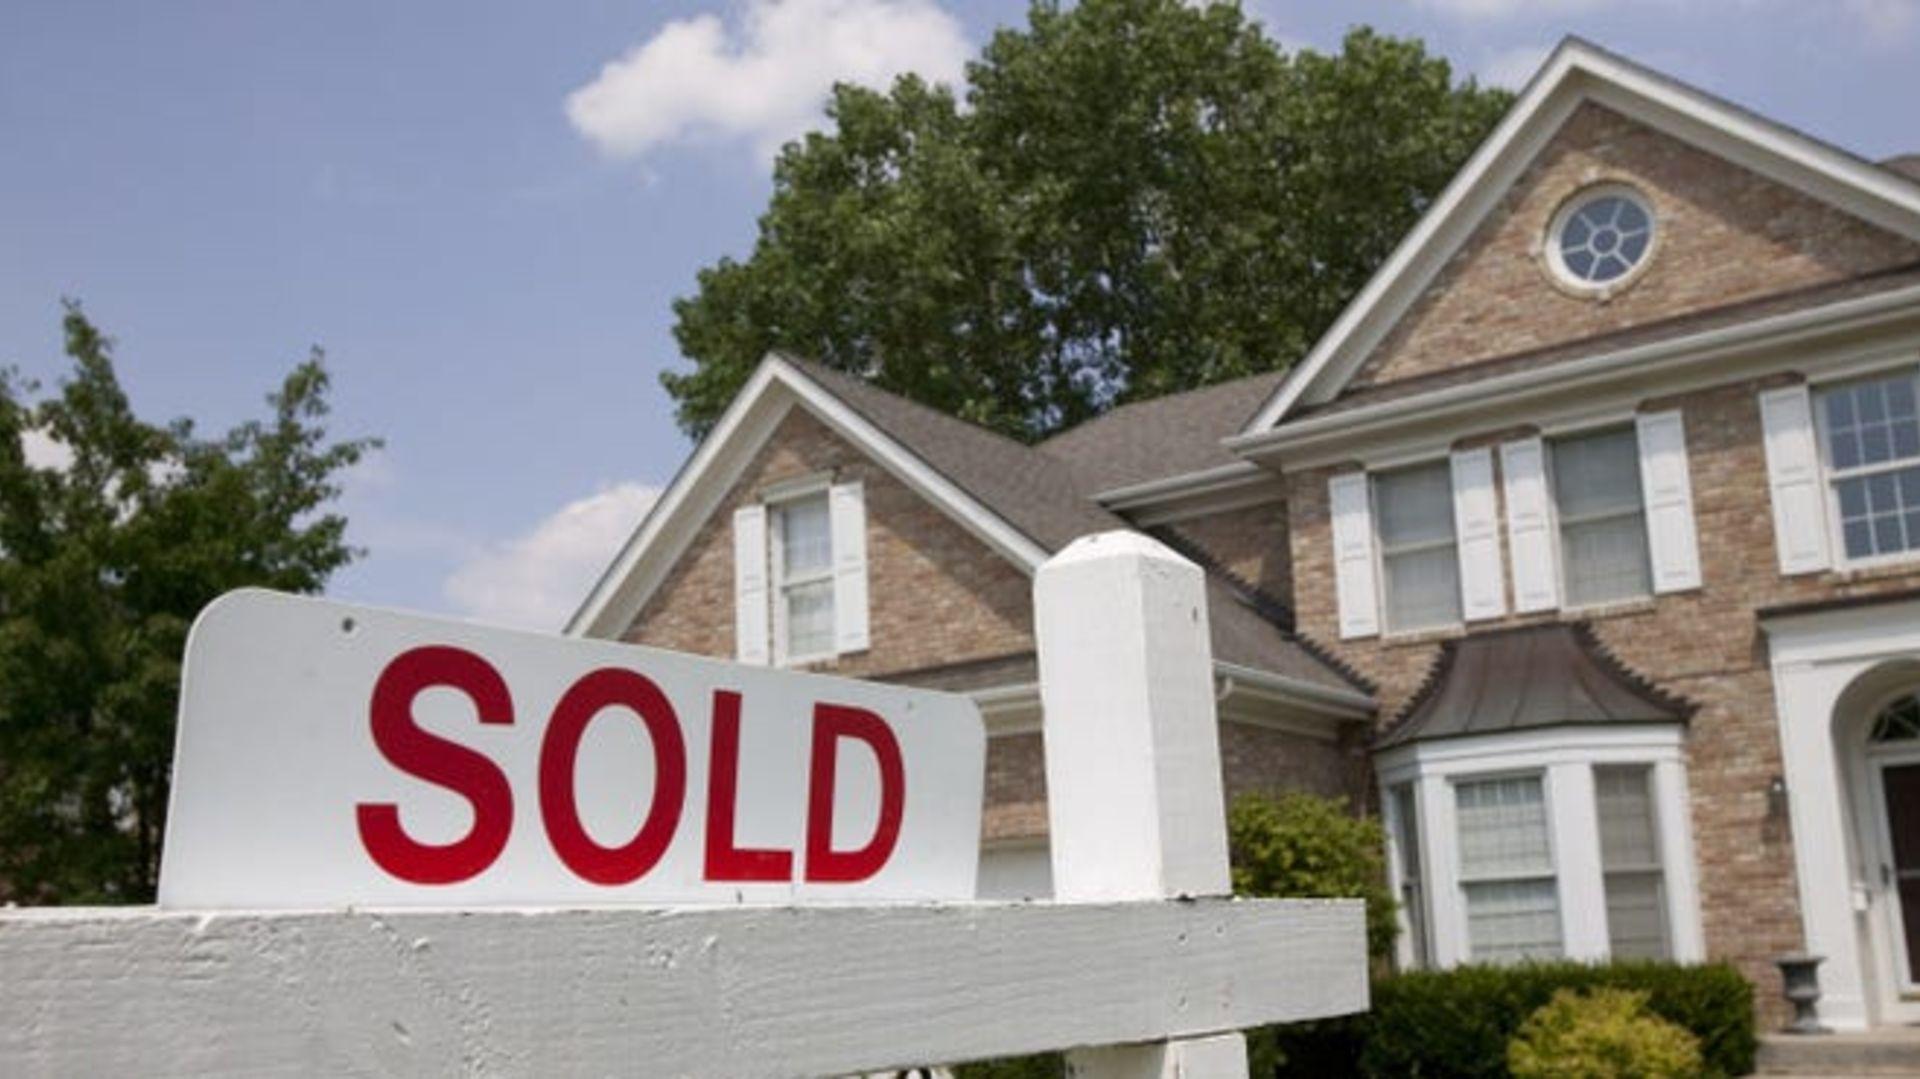 Maine Real Estate Soars In Spite Of COVID